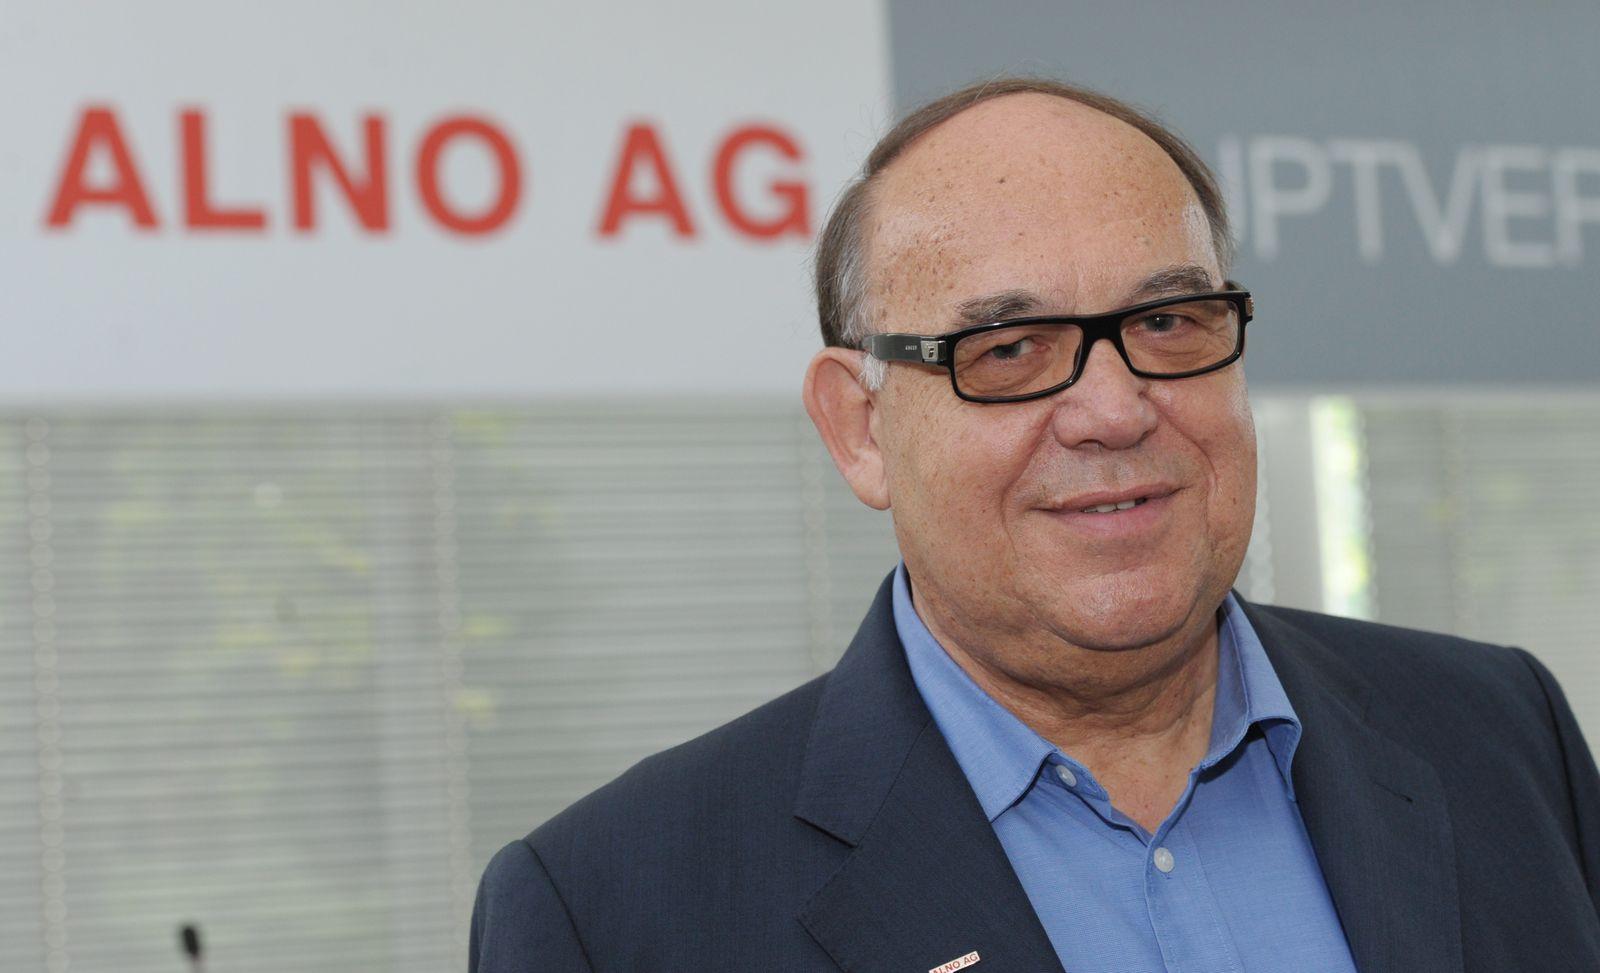 Alno / Max Müller / CEO